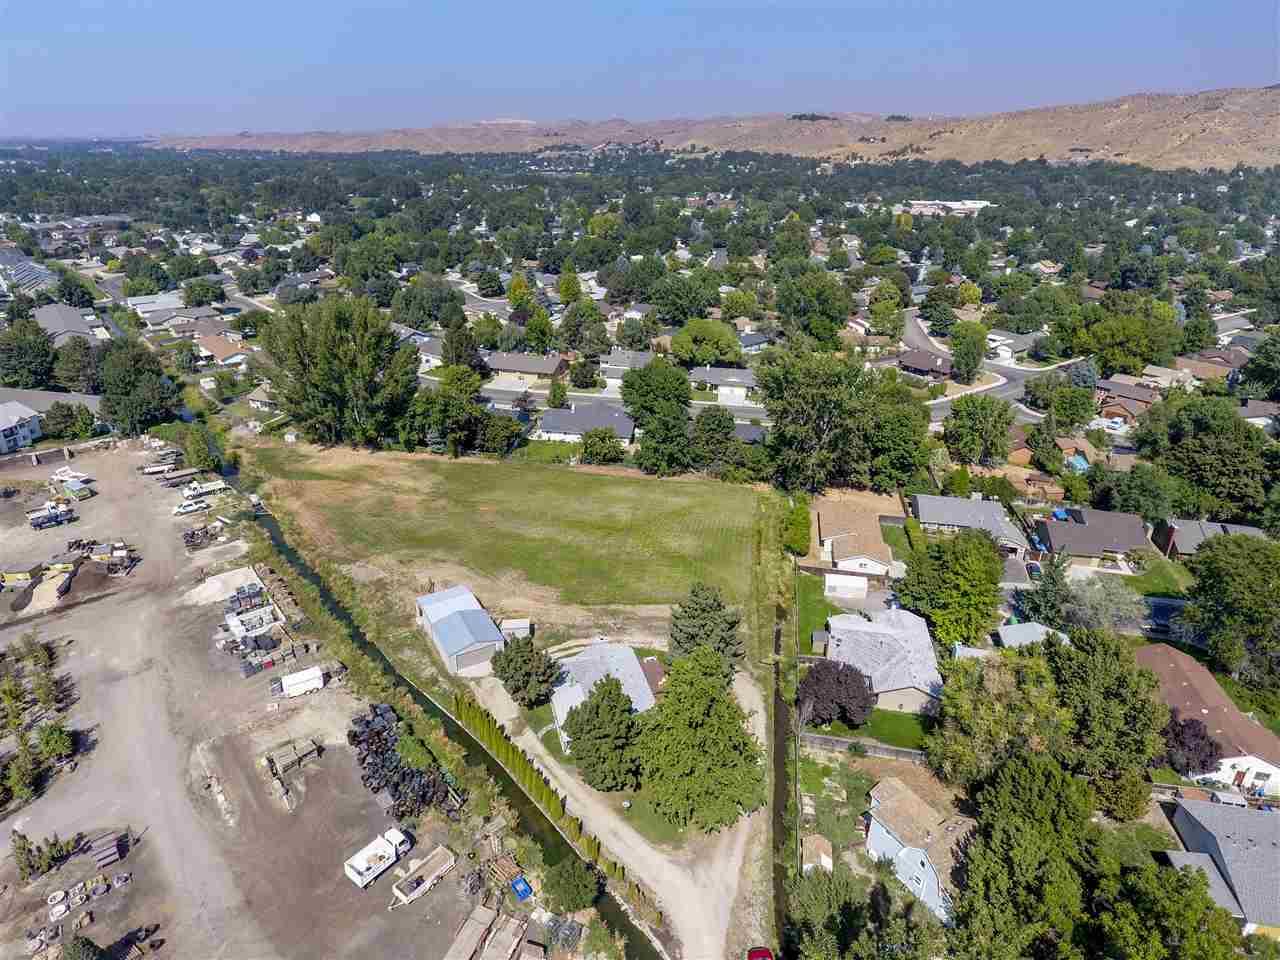 5614 Bloom Street,Boise,Idaho 83703,Land,5614 Bloom Street,98682288